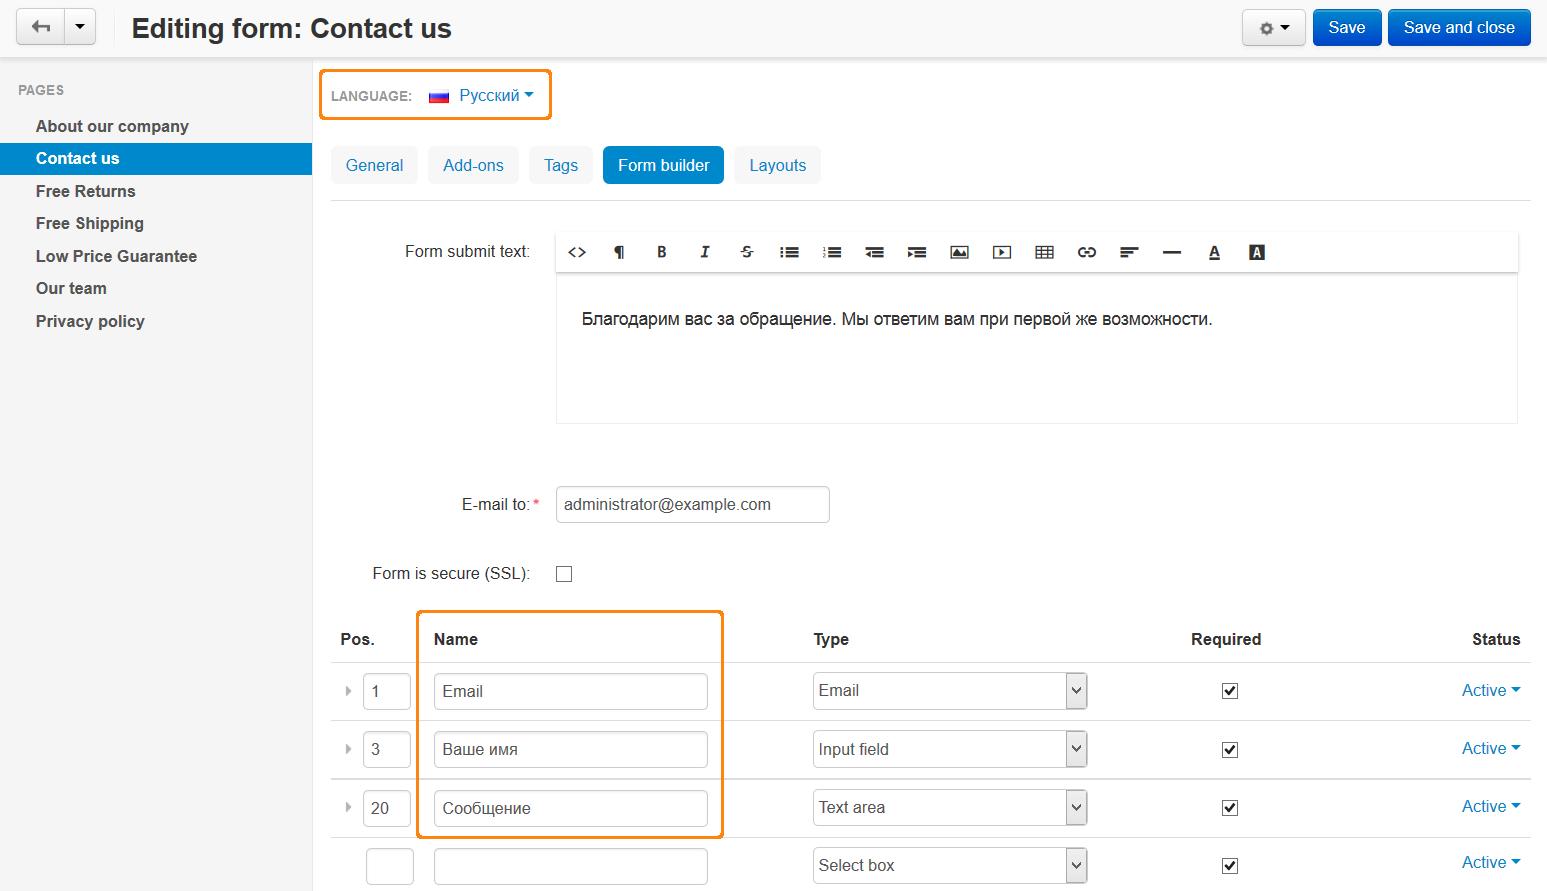 clip art, how develop, academic journals, graph table, on online form builder database